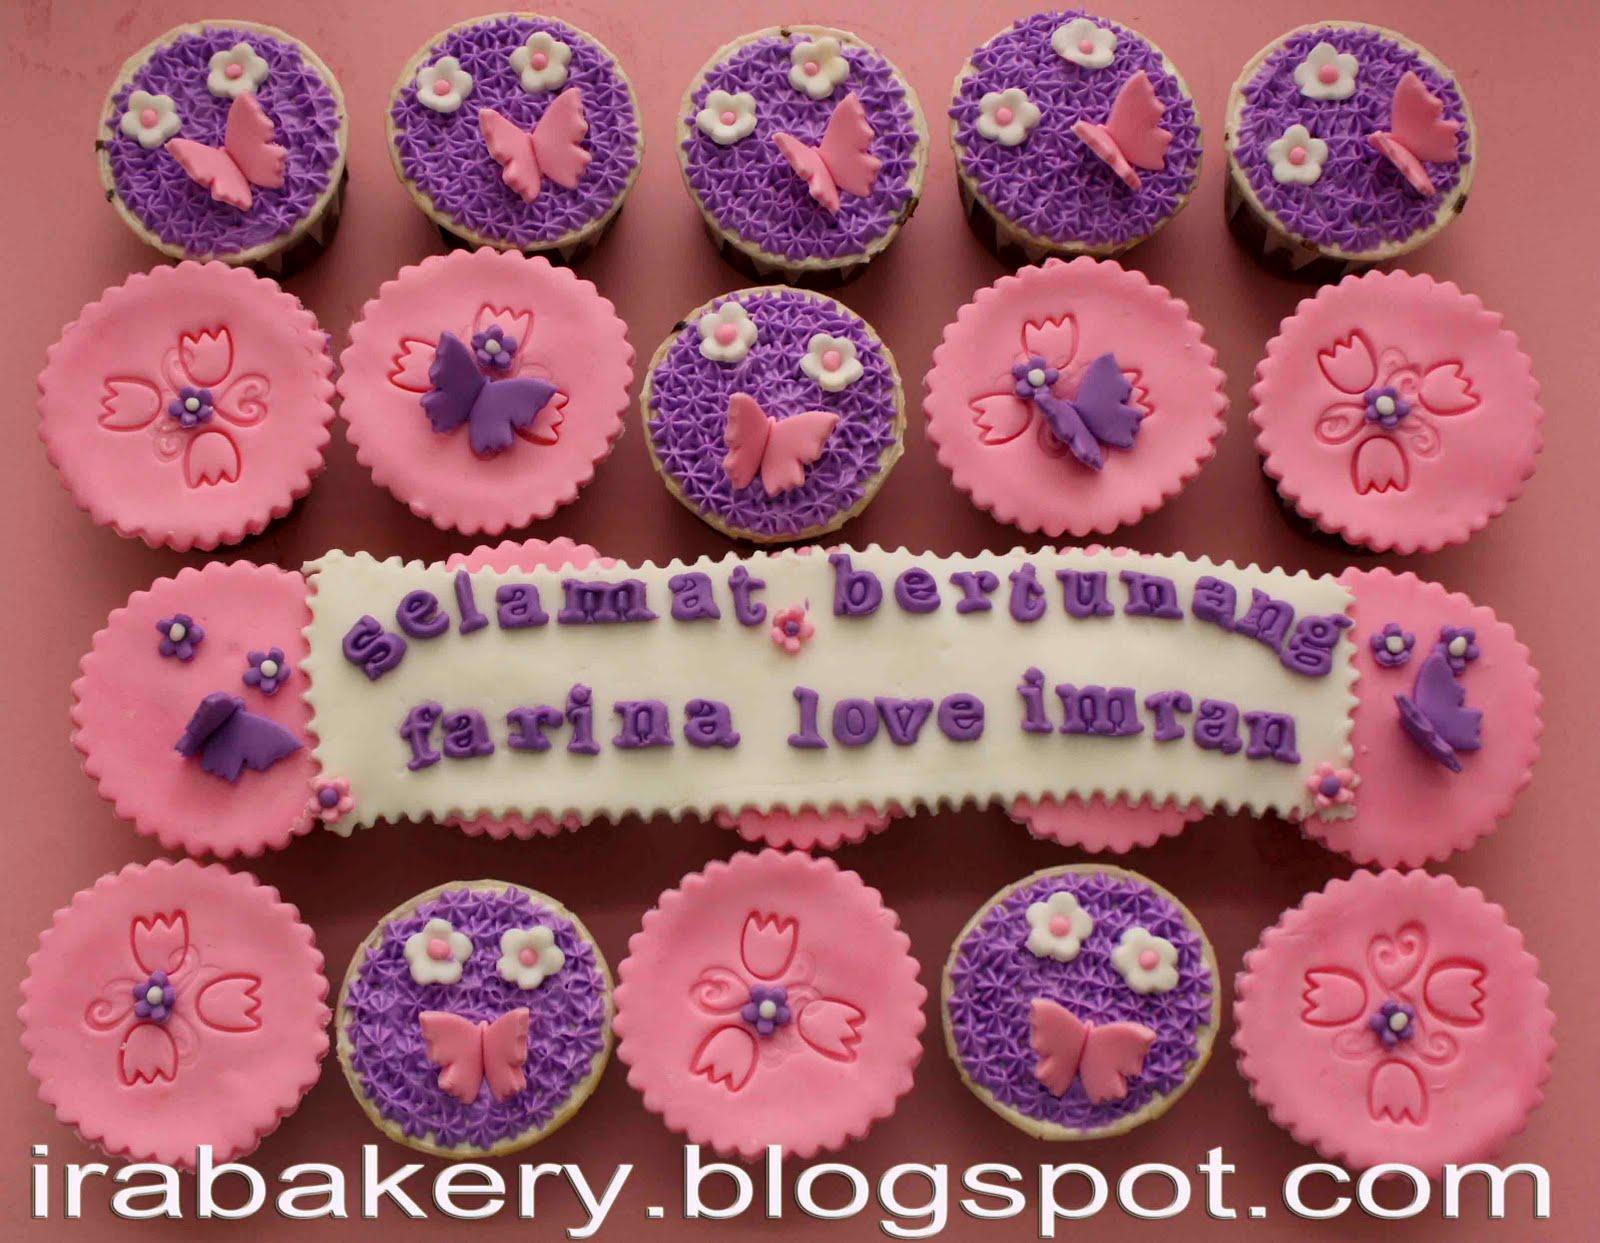 http://1.bp.blogspot.com/_ESXaFy3dunE/TB-WIQACBmI/AAAAAAAABG0/hos3osPTWSQ/s1600/cupcakes%2Btunang%2Bfarina_2e.jpg